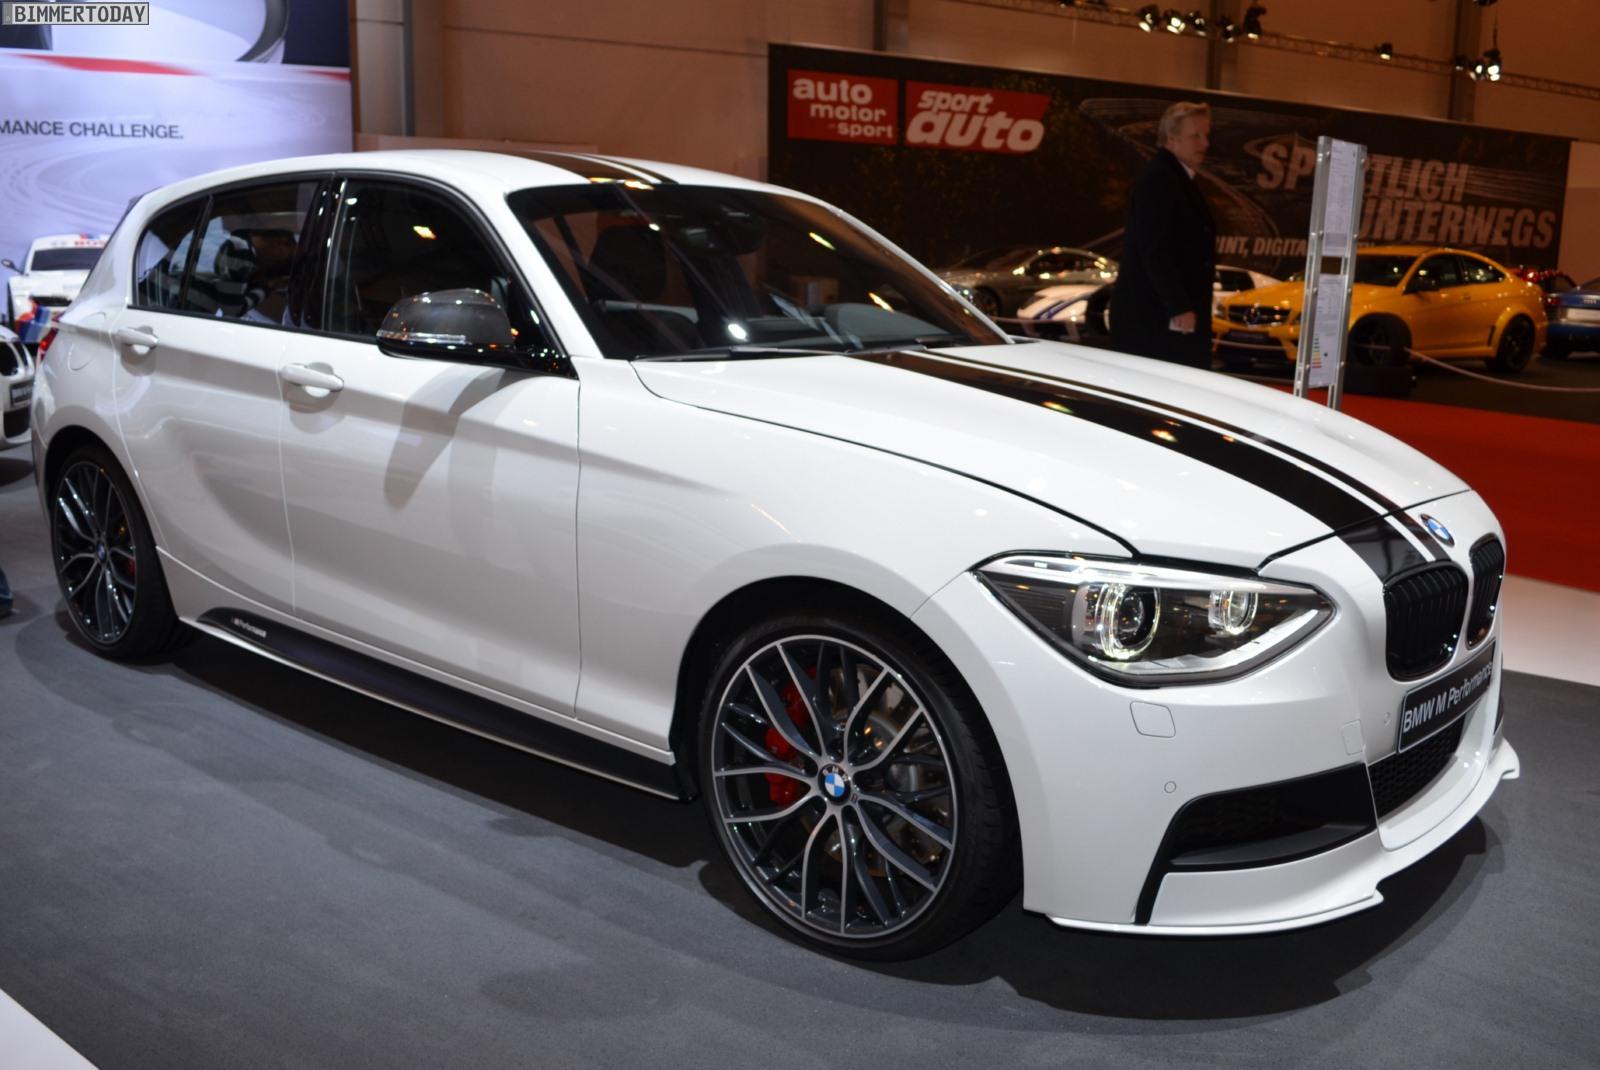 BMW M Performance 125i 1er F20 Tuning Essen Motor Show 2012 01